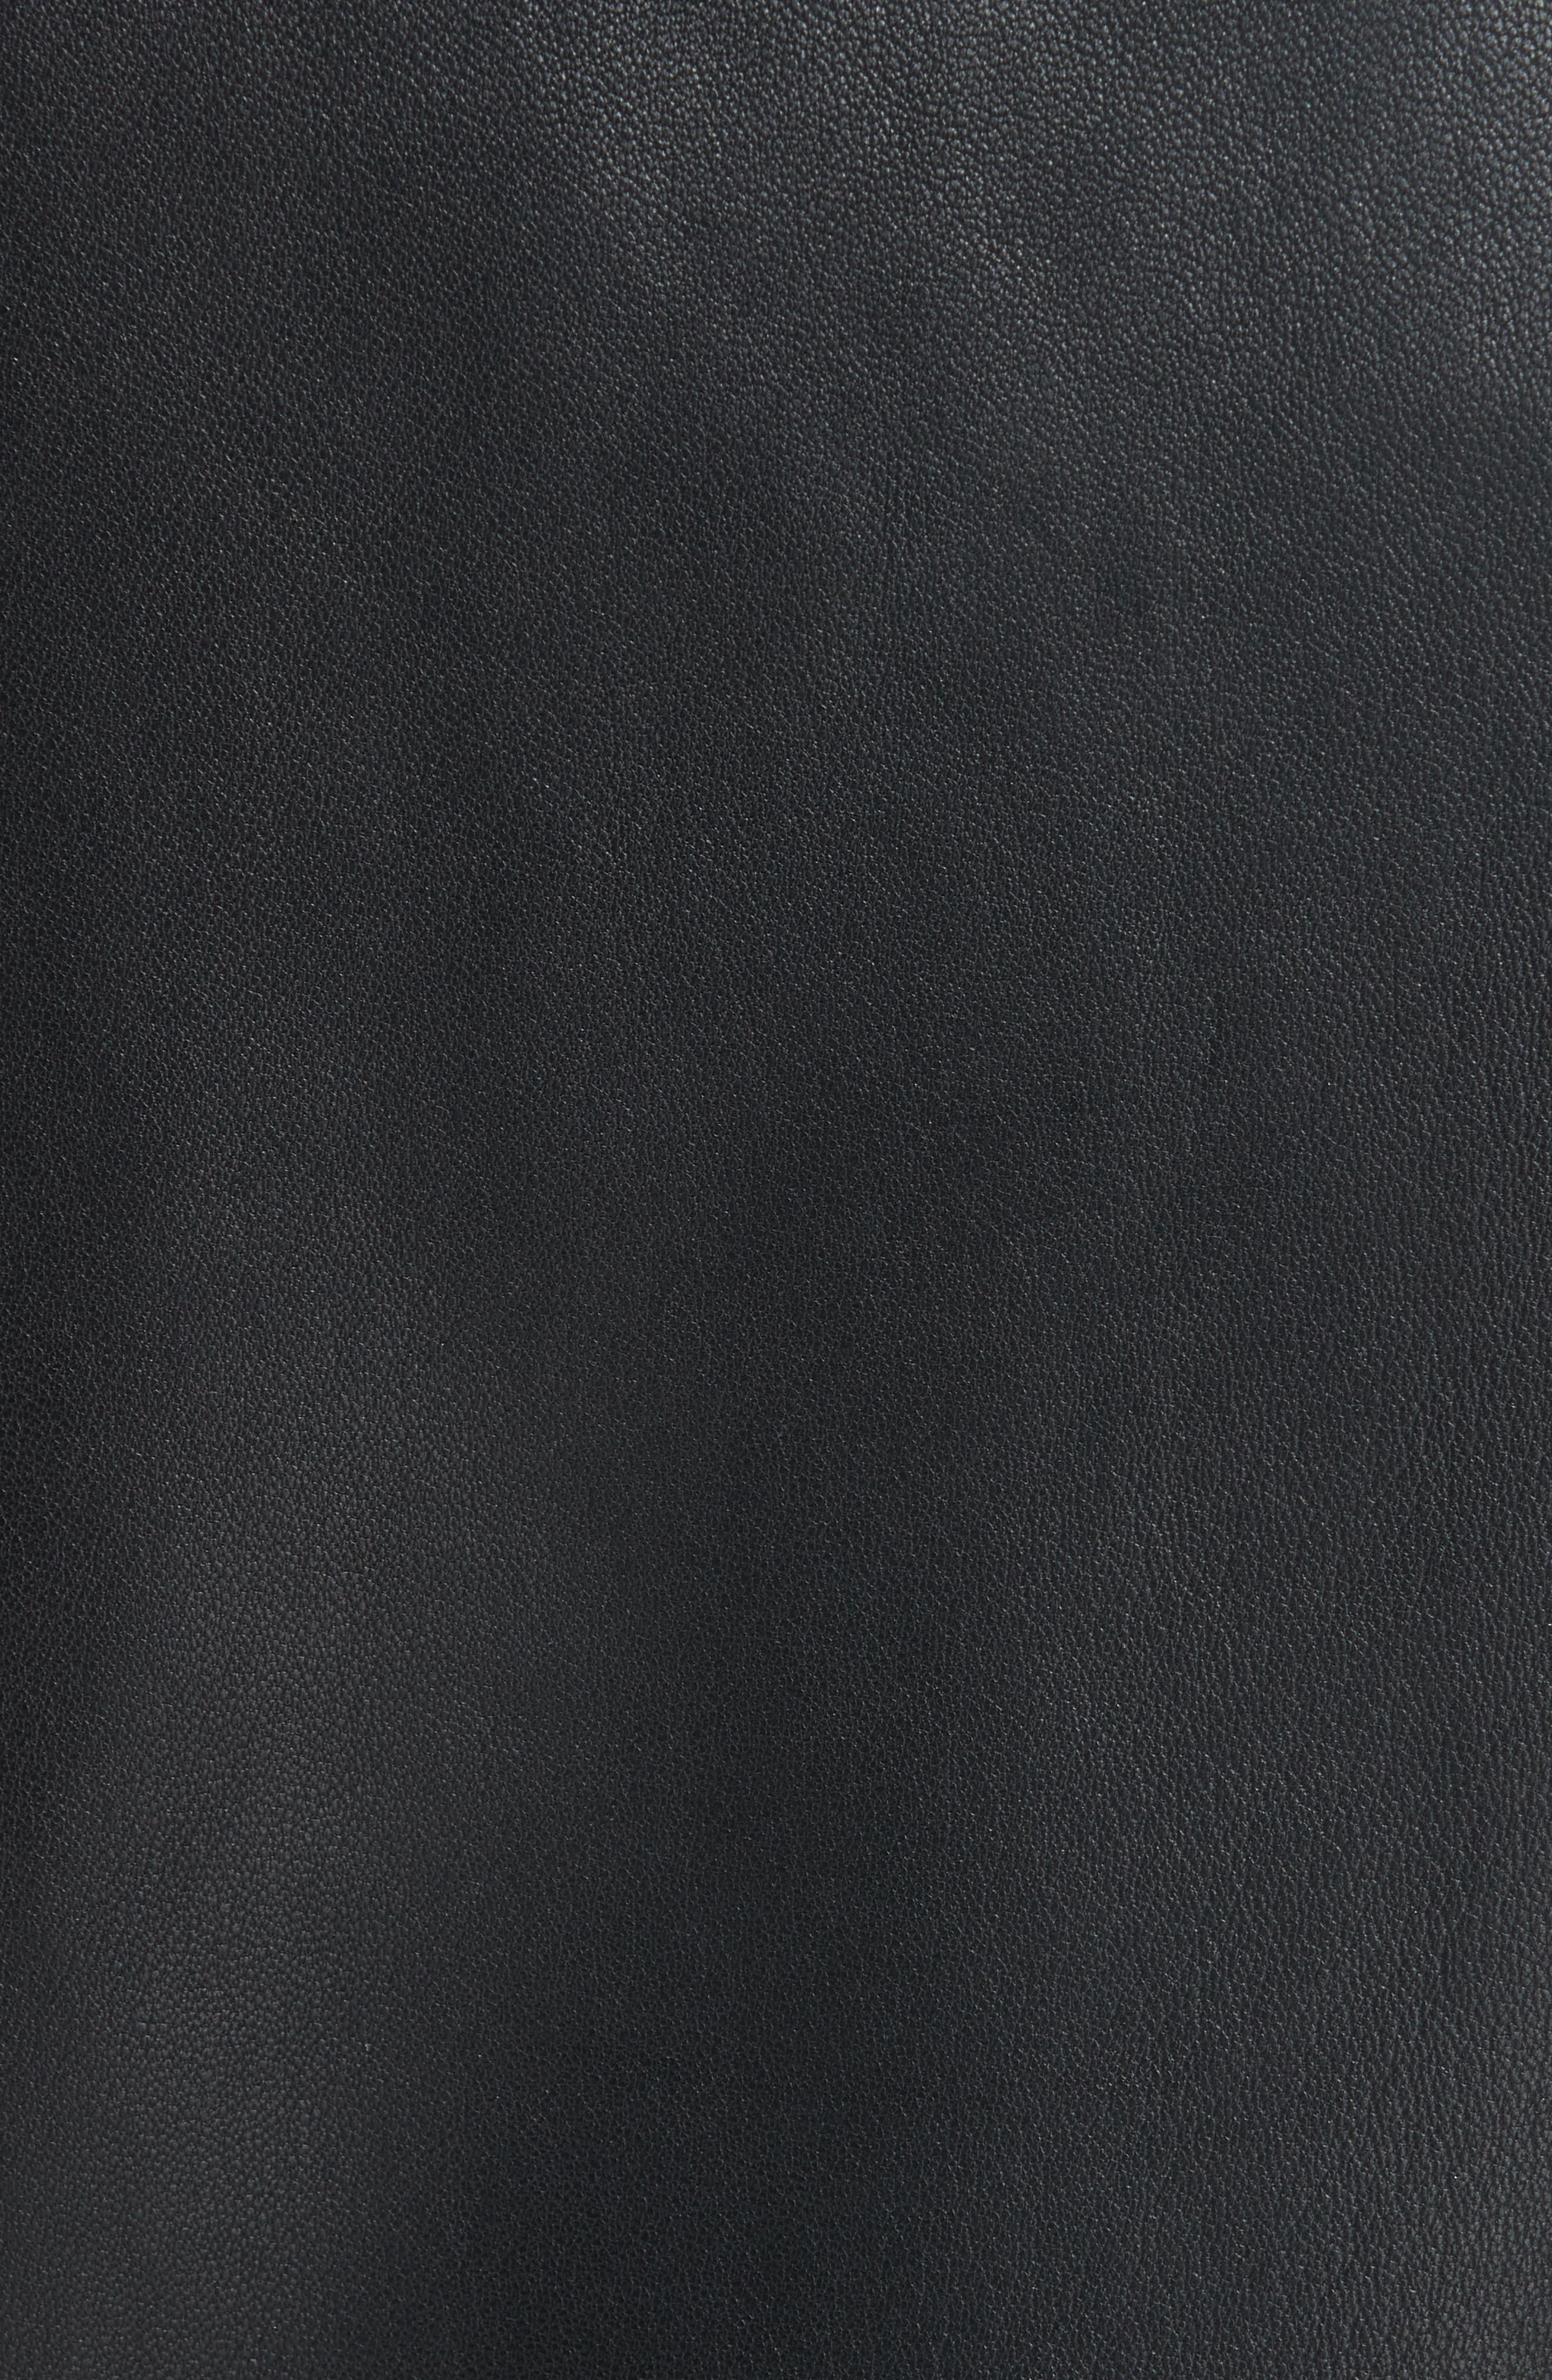 Mock Core Leather Moto Jacket,                             Alternate thumbnail 6, color,                             BLACK